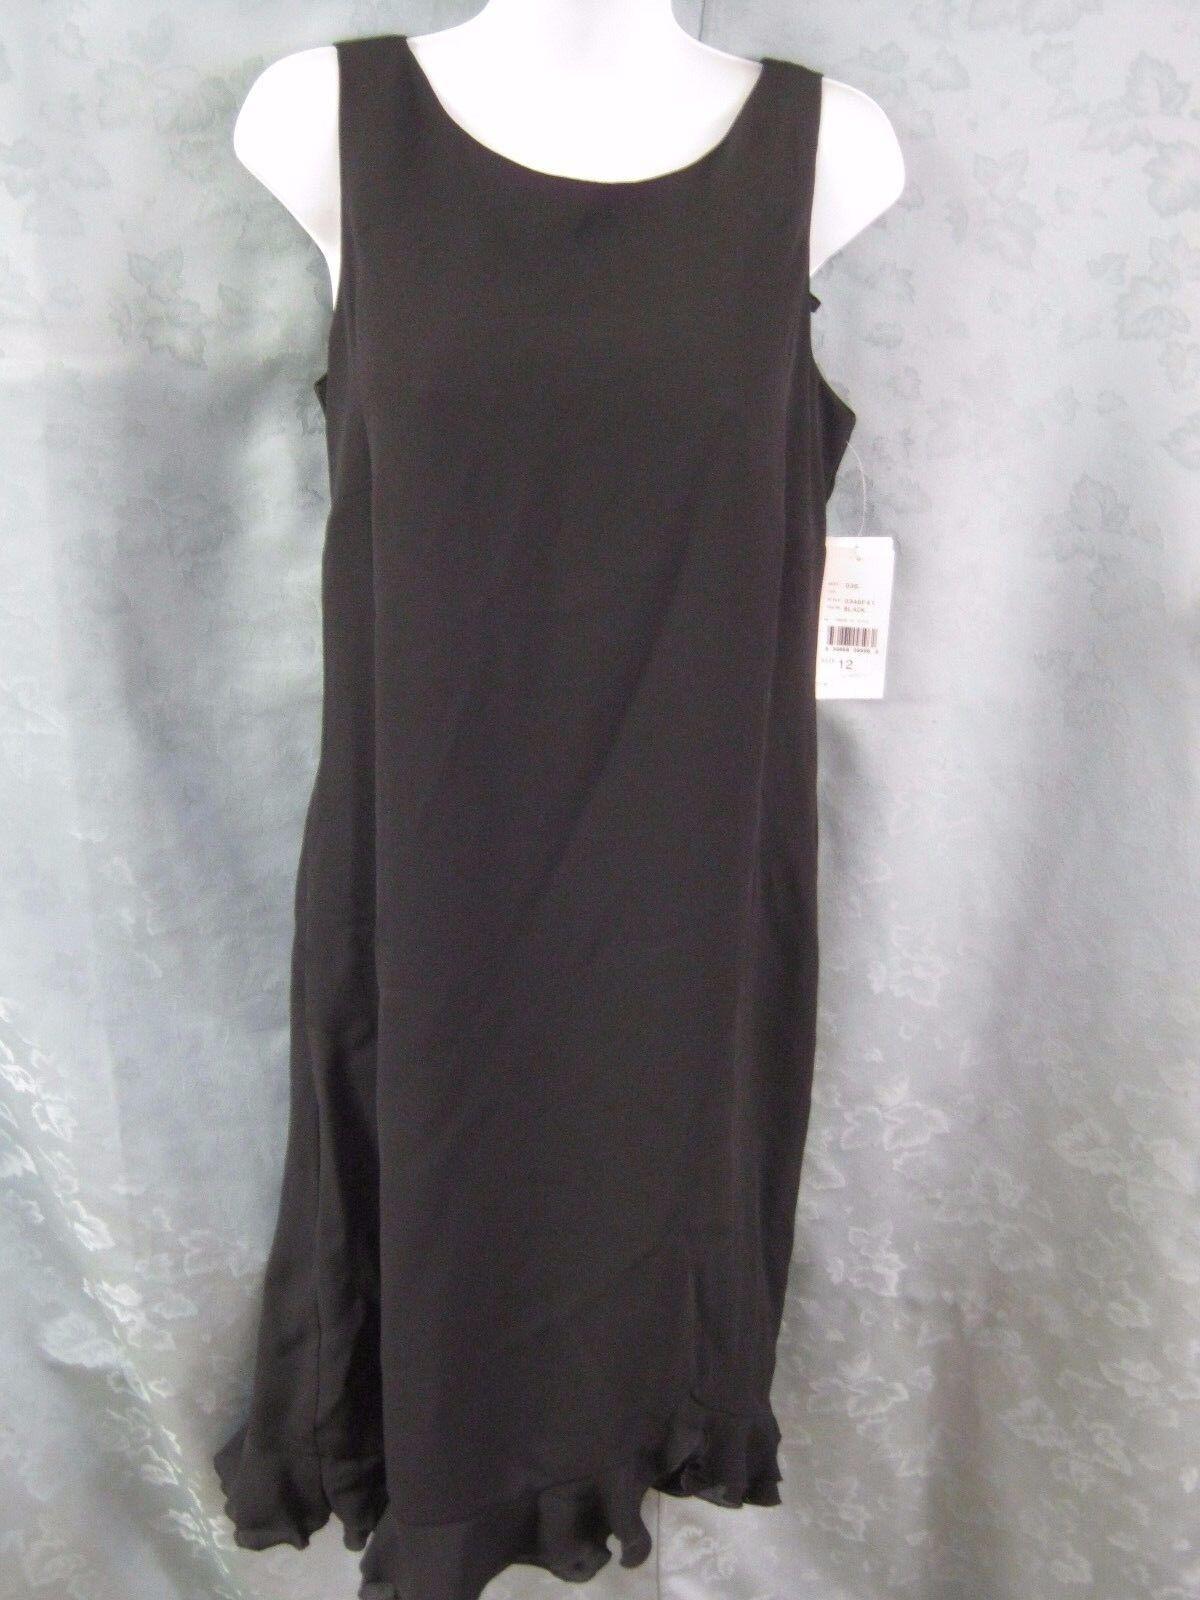 AGB Dress Size 12 Sleeveless Classic Ruffled Hem LBD Fully Lined NWT NEW